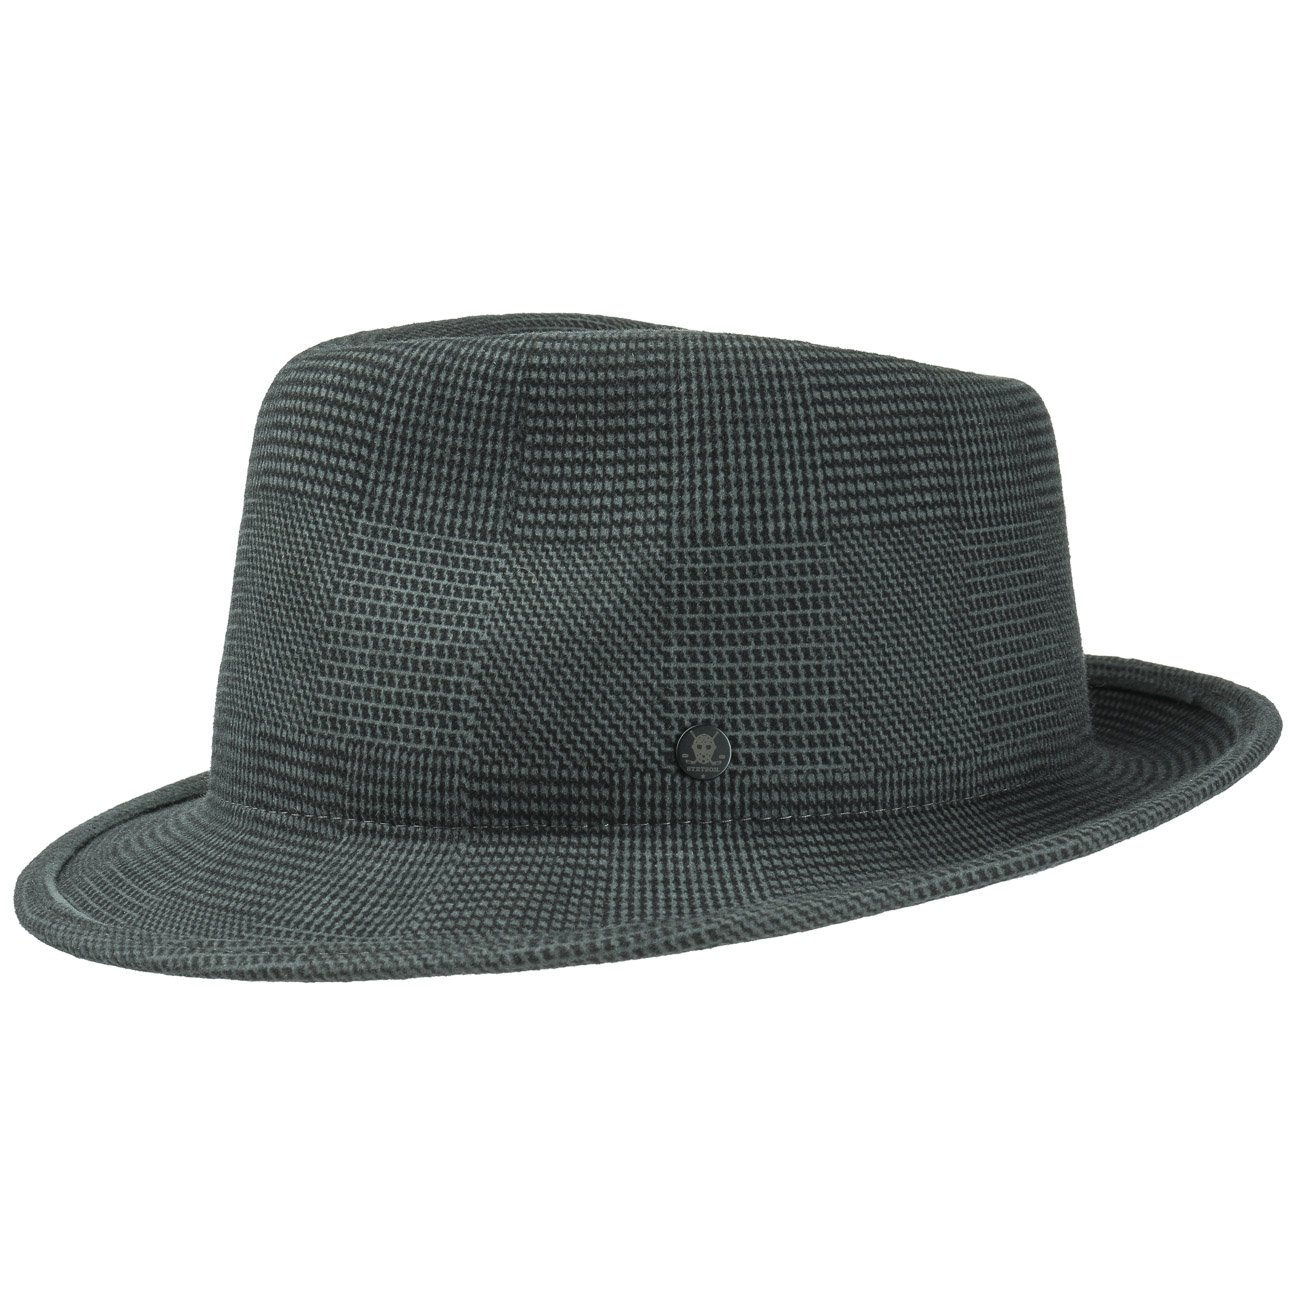 d54192305baf1c Stetson Virgi Wool Felt Fedora Hat Fedora Felt Hat: Amazon.co.uk: Clothing